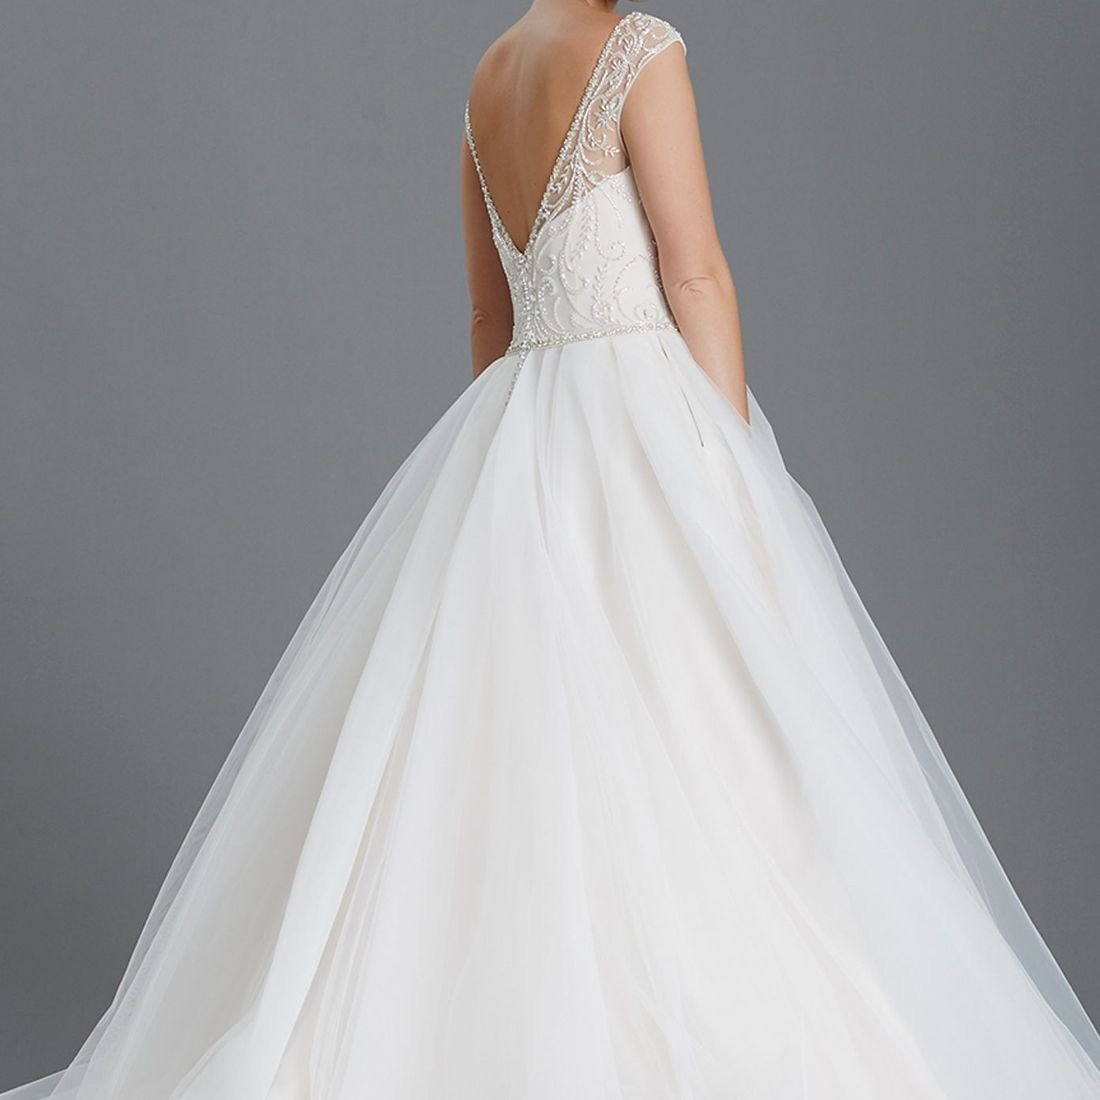 Princess wedding dress, tulle skirt